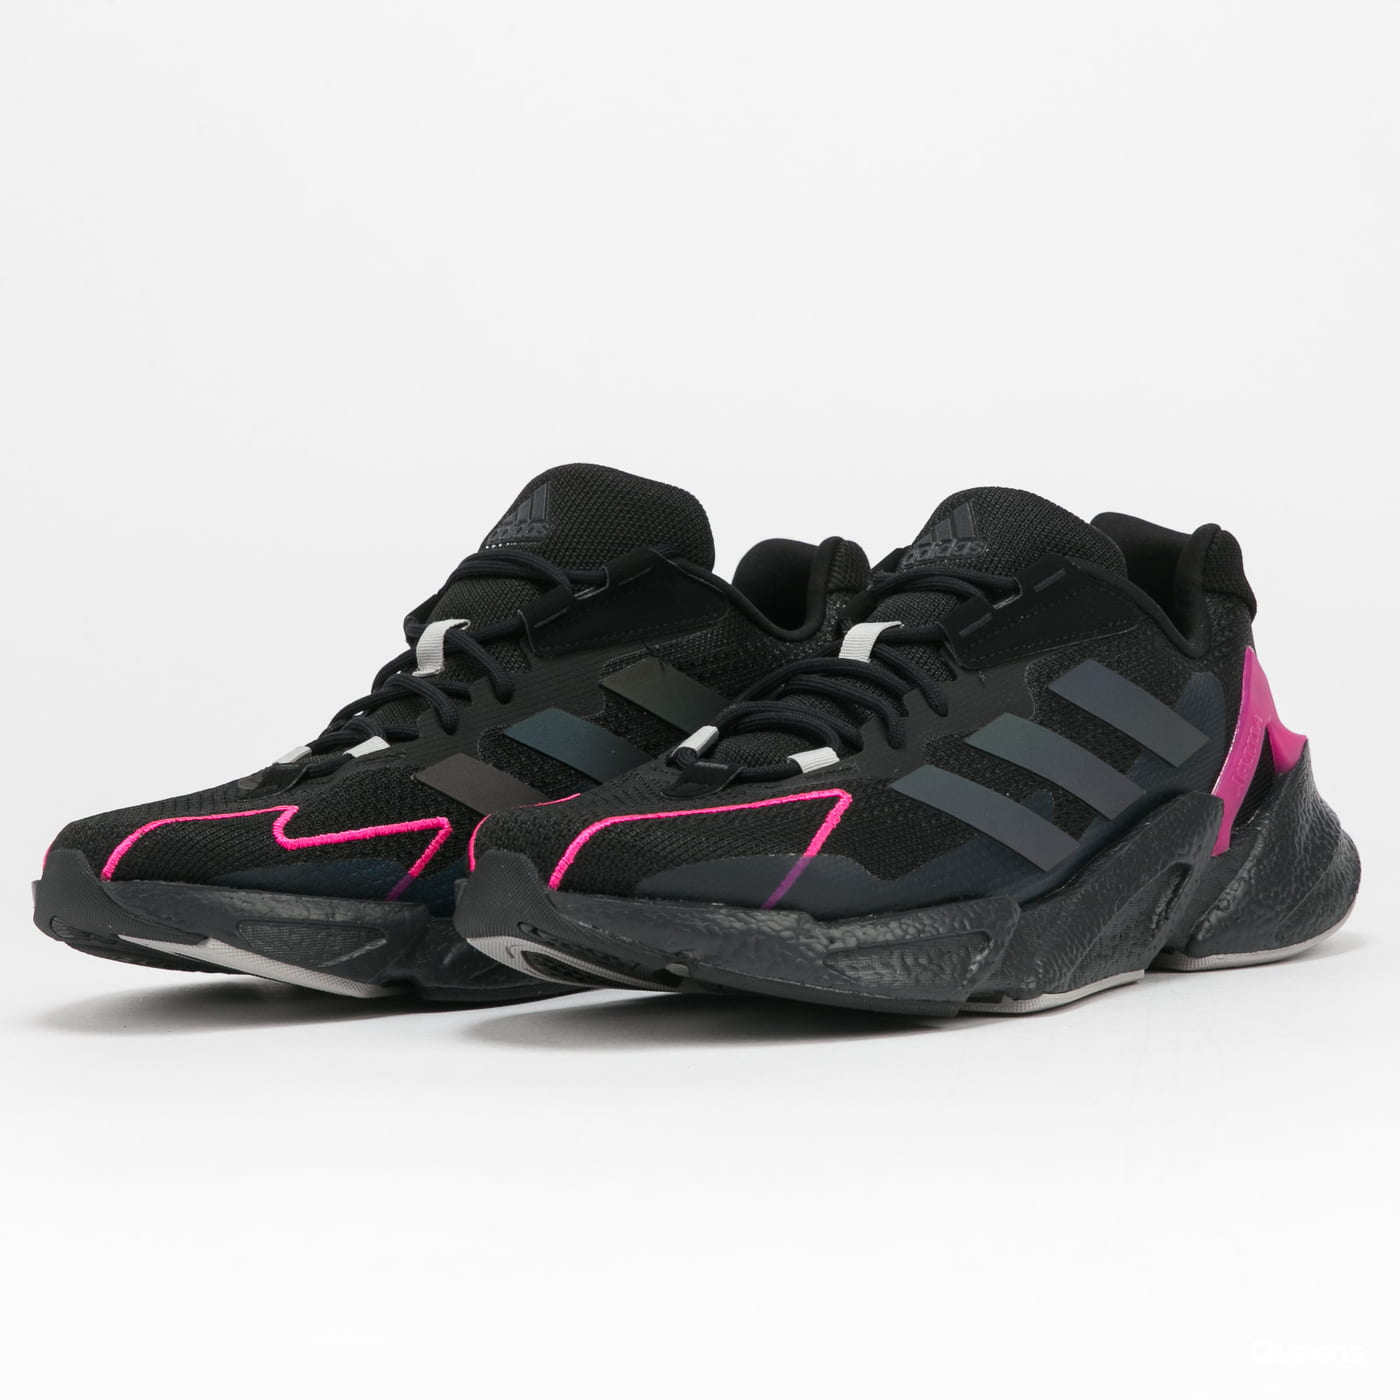 adidas Performance X9000L4 M cblack / cblack / shopnk